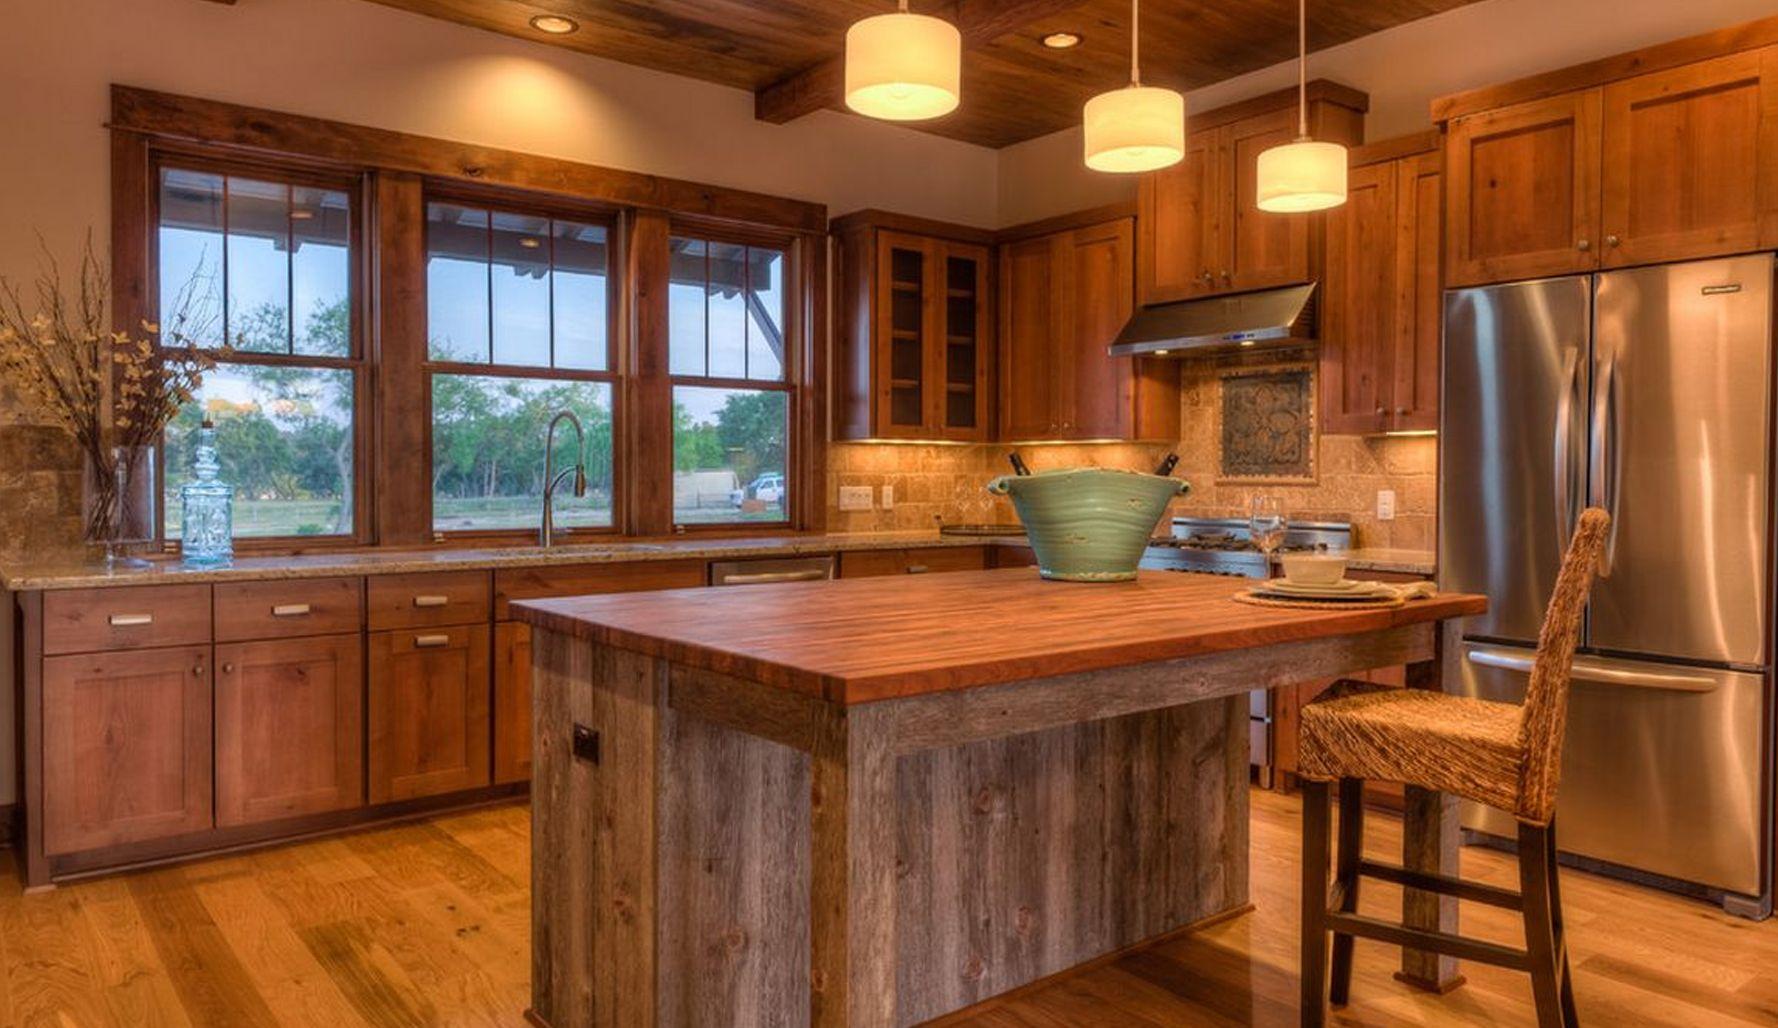 muebles de cocina rusticos - Buscar con Google | HOGAR | Pinterest ...